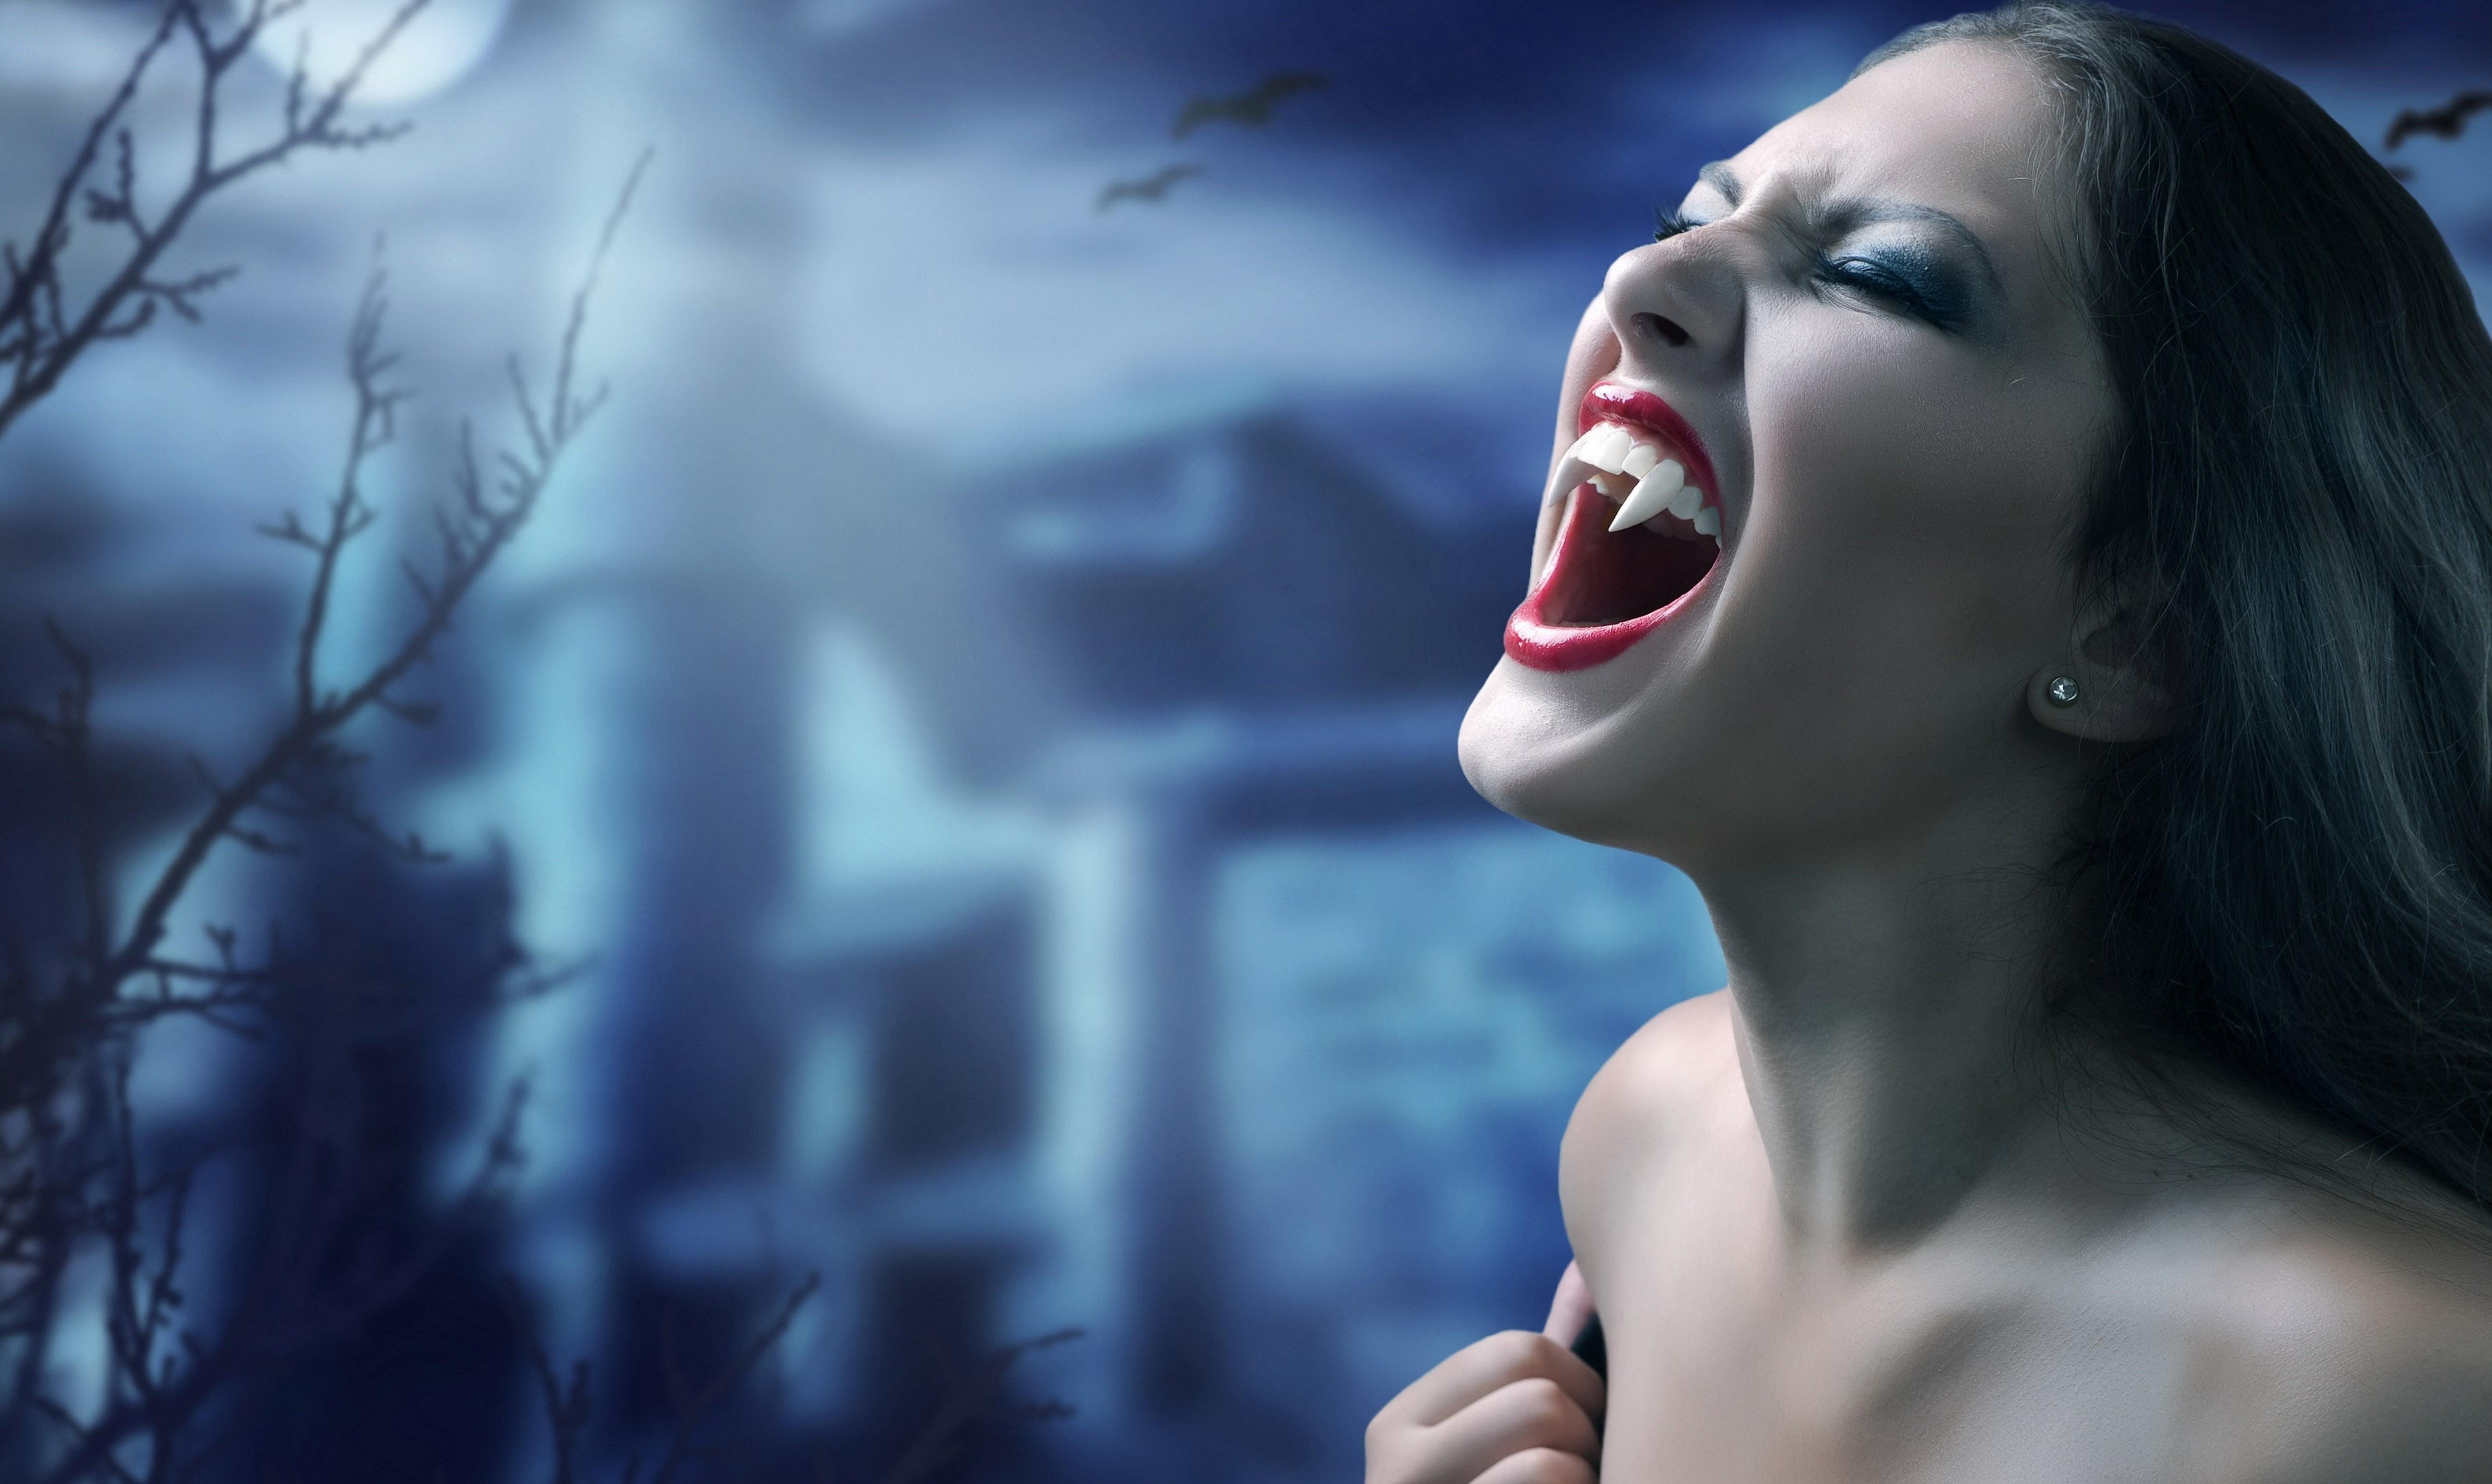 Girls-Horror-Desktop-Wallpapers